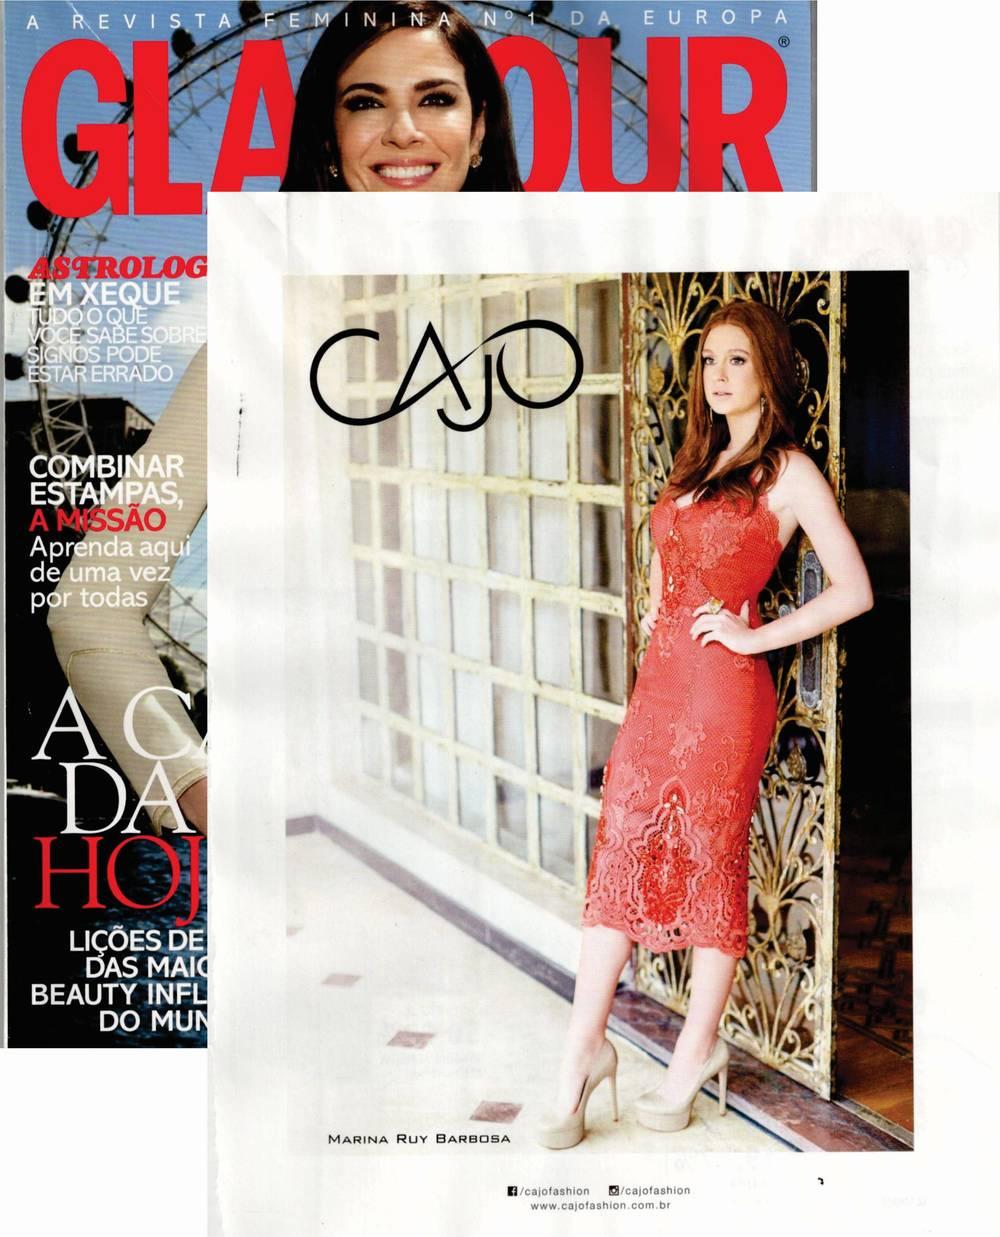 Cajo - Revista Glamour - Julho 2015.jpg